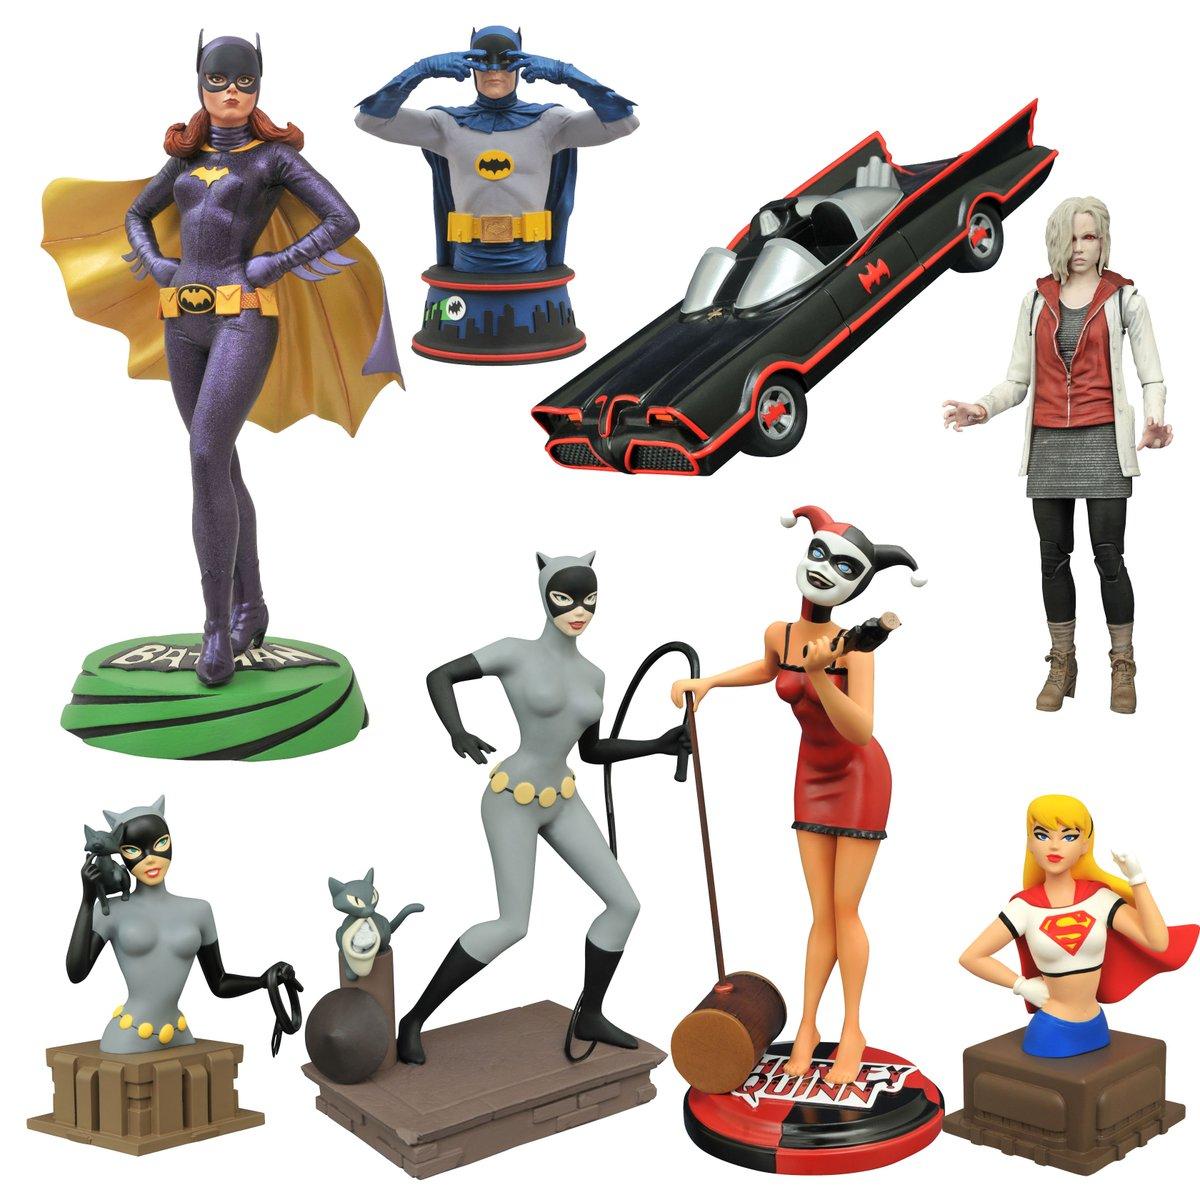 Big week at comic shops! #iZombie #Batman #Batgirl #Supergirl #HarleyQuinn #Catwoman by DST! https://t.co/VpYv2tHWjG https://t.co/exbEL1IcWX